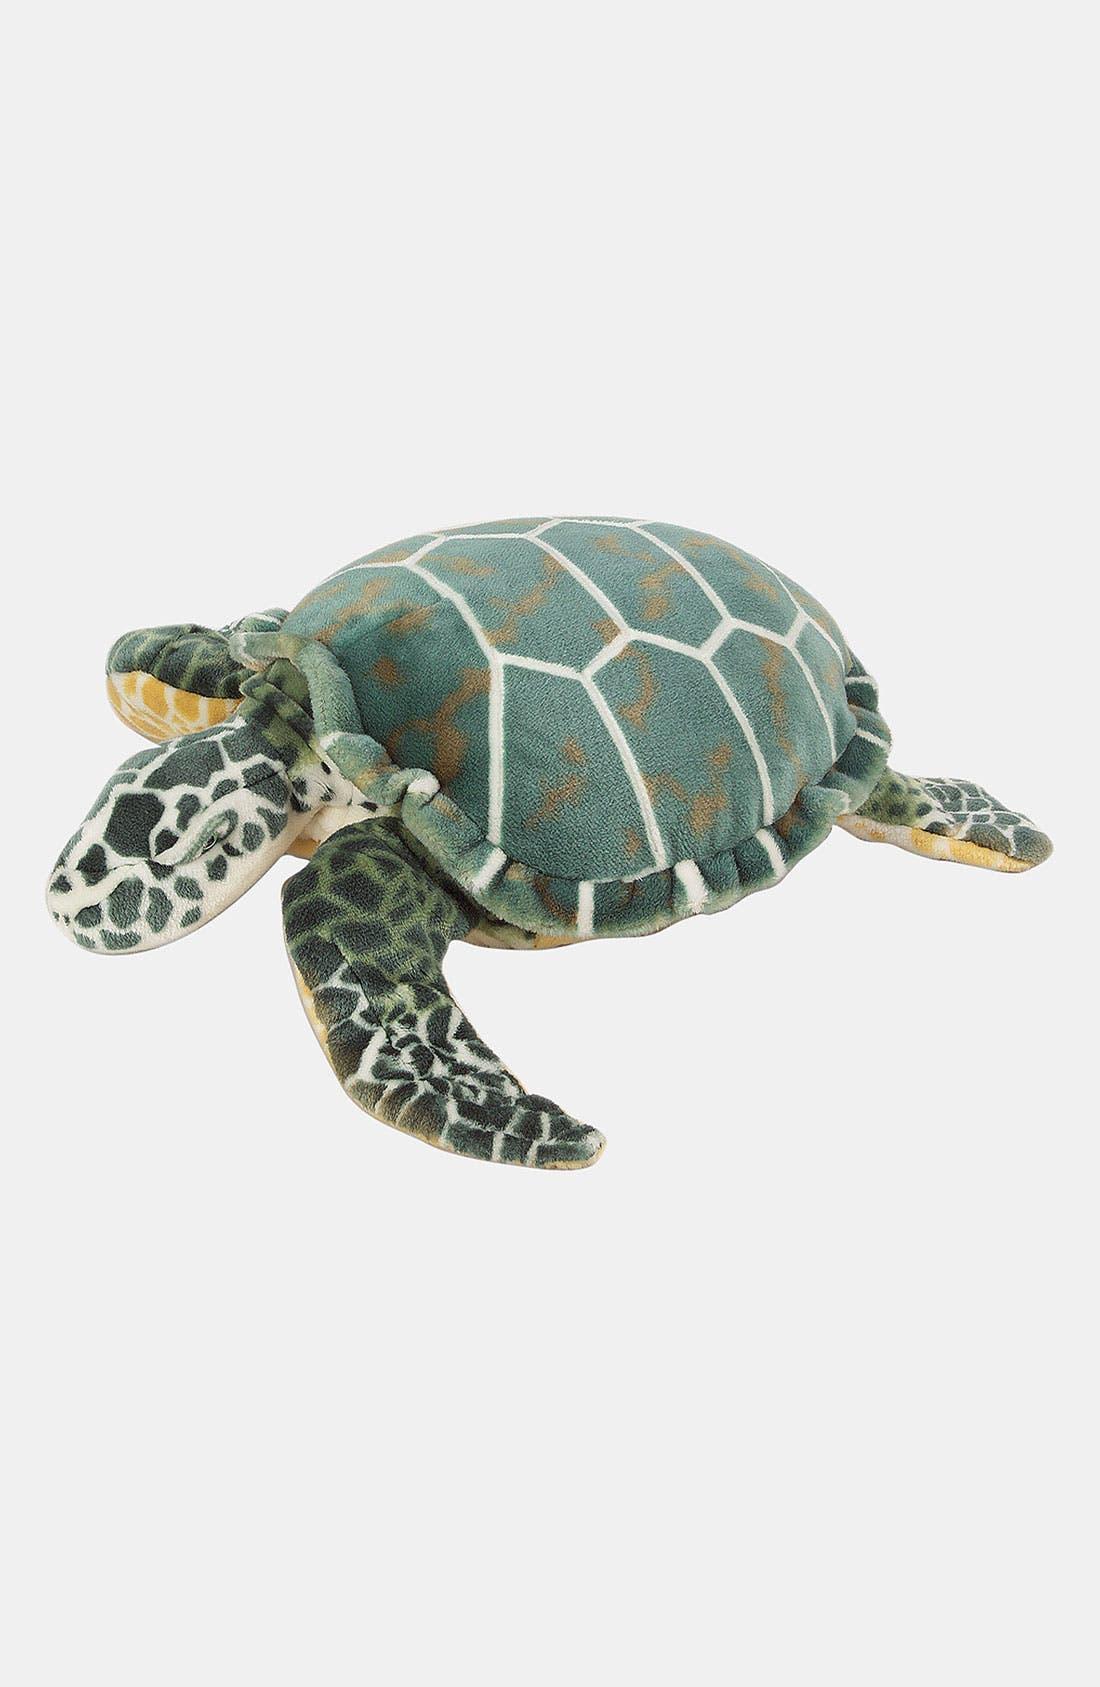 Oversized Plush Stuffed Sea Turtle,                             Main thumbnail 1, color,                             VARIOUS